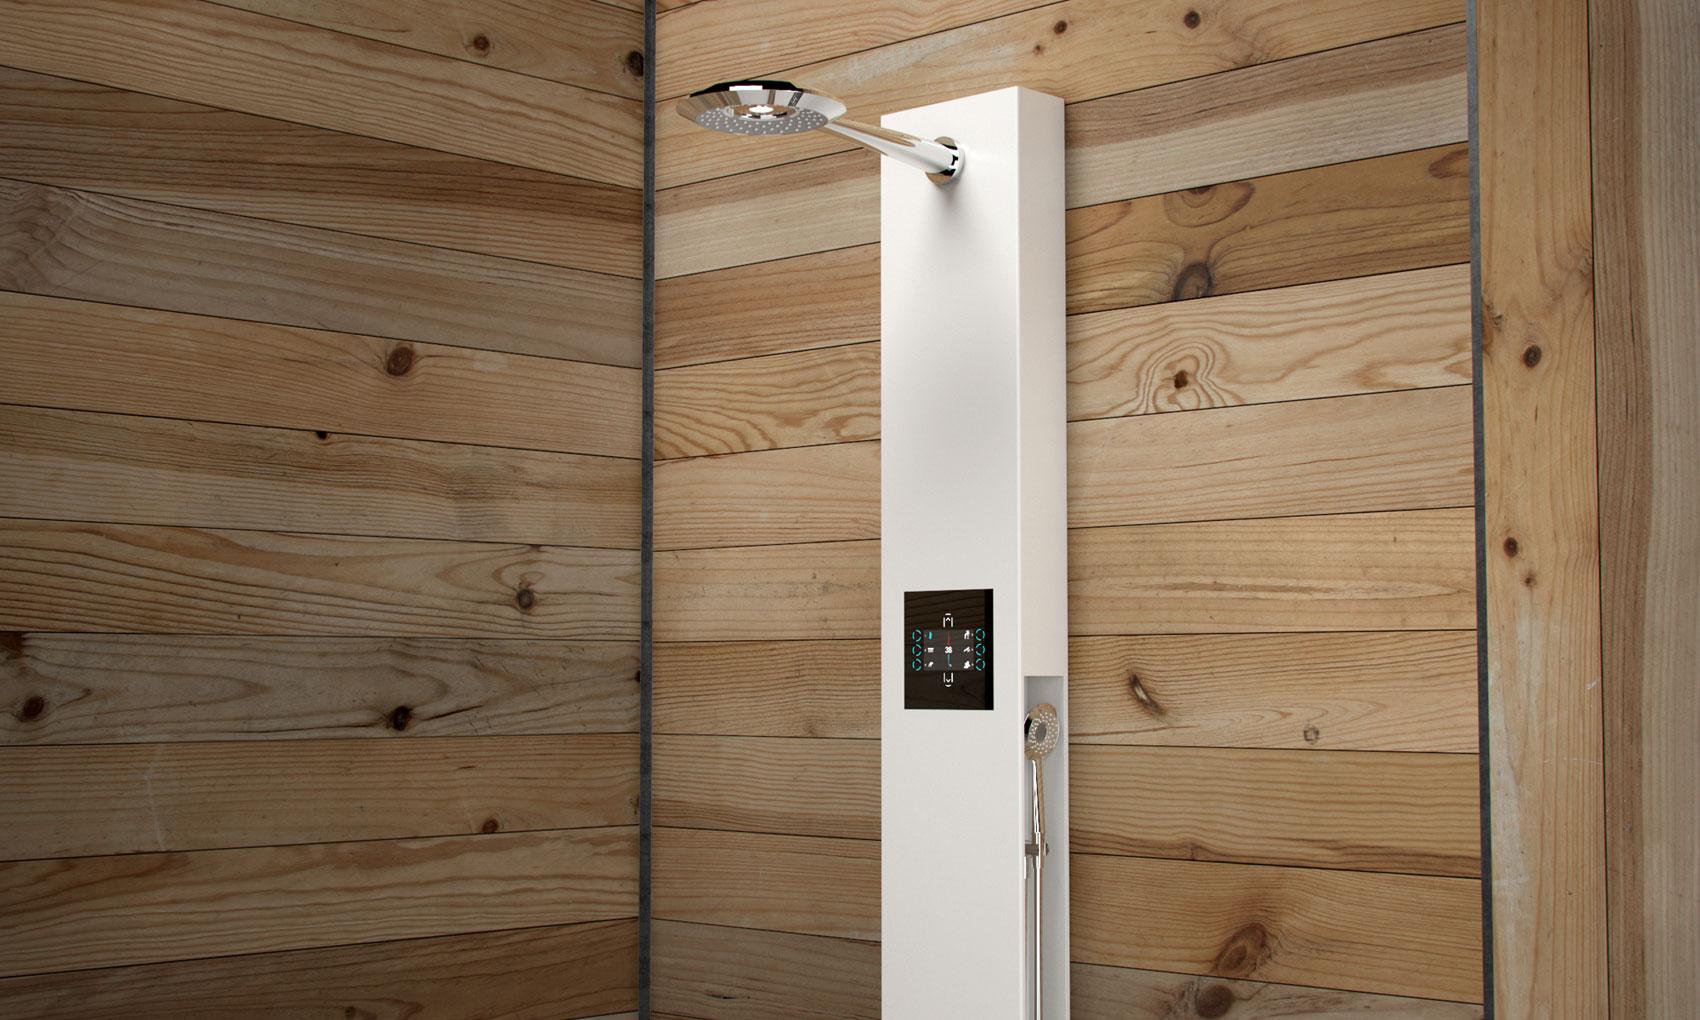 03-douche-showerpad-insens-inman